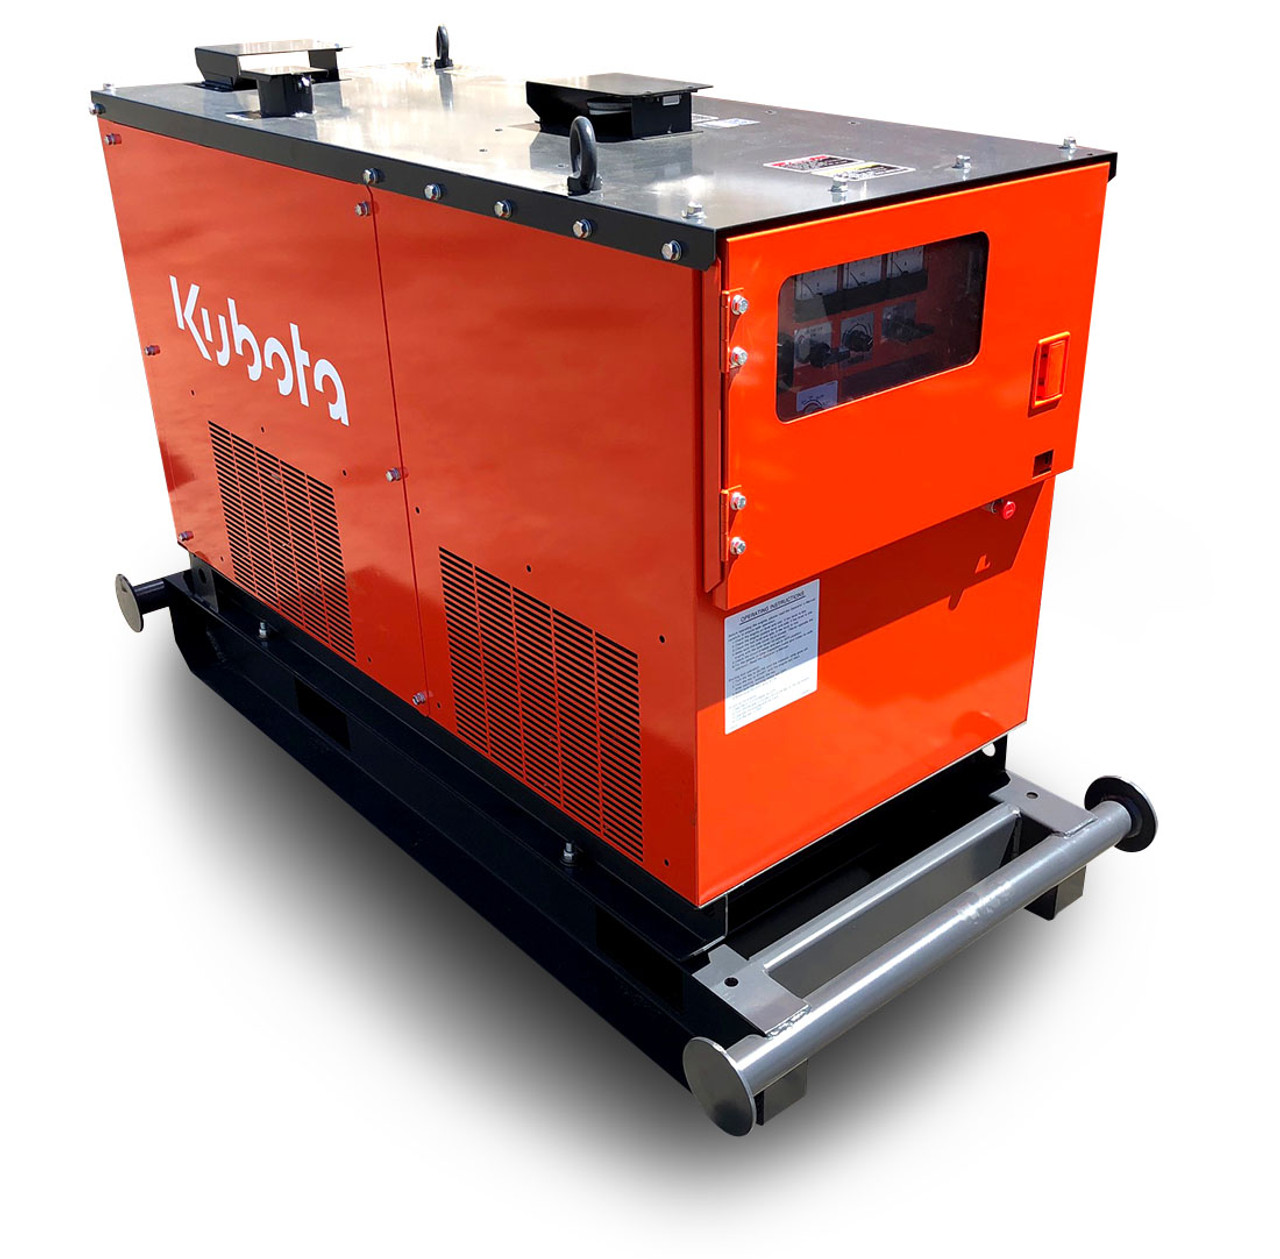 Renowned Kubota diesel engine, KJ series quieter and more efficient